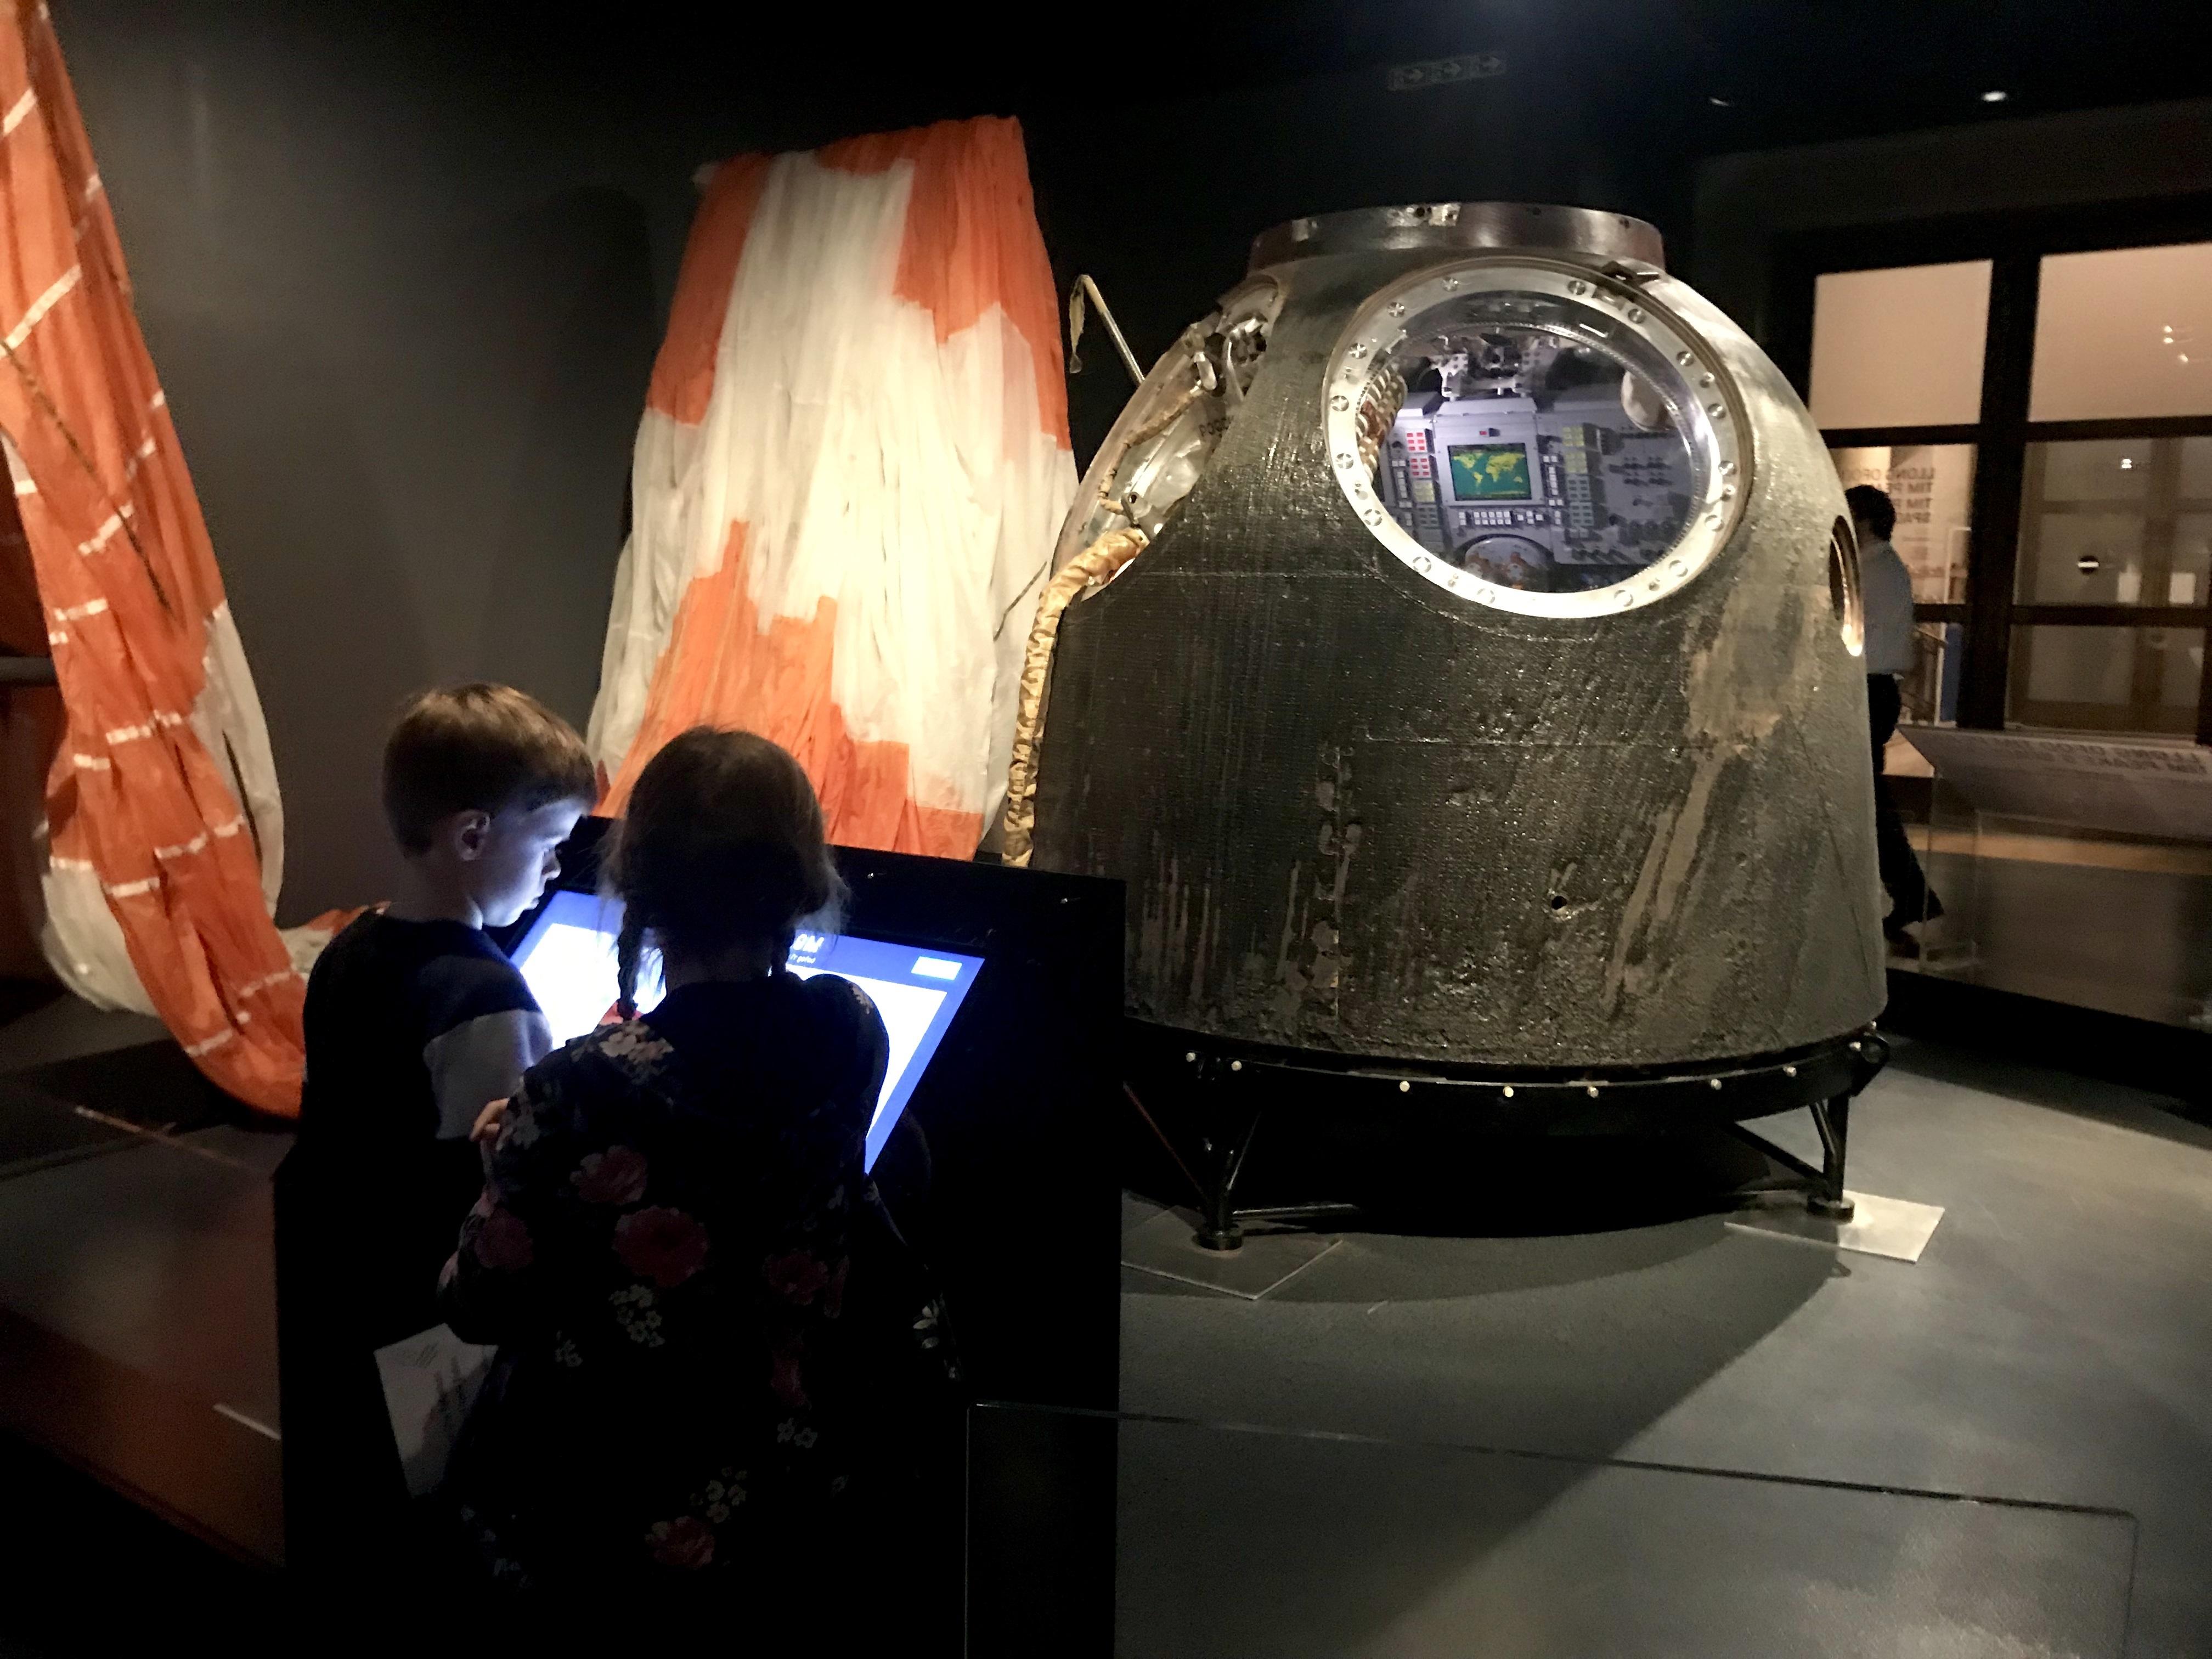 Tim Peake's Spacecraft Cardiff